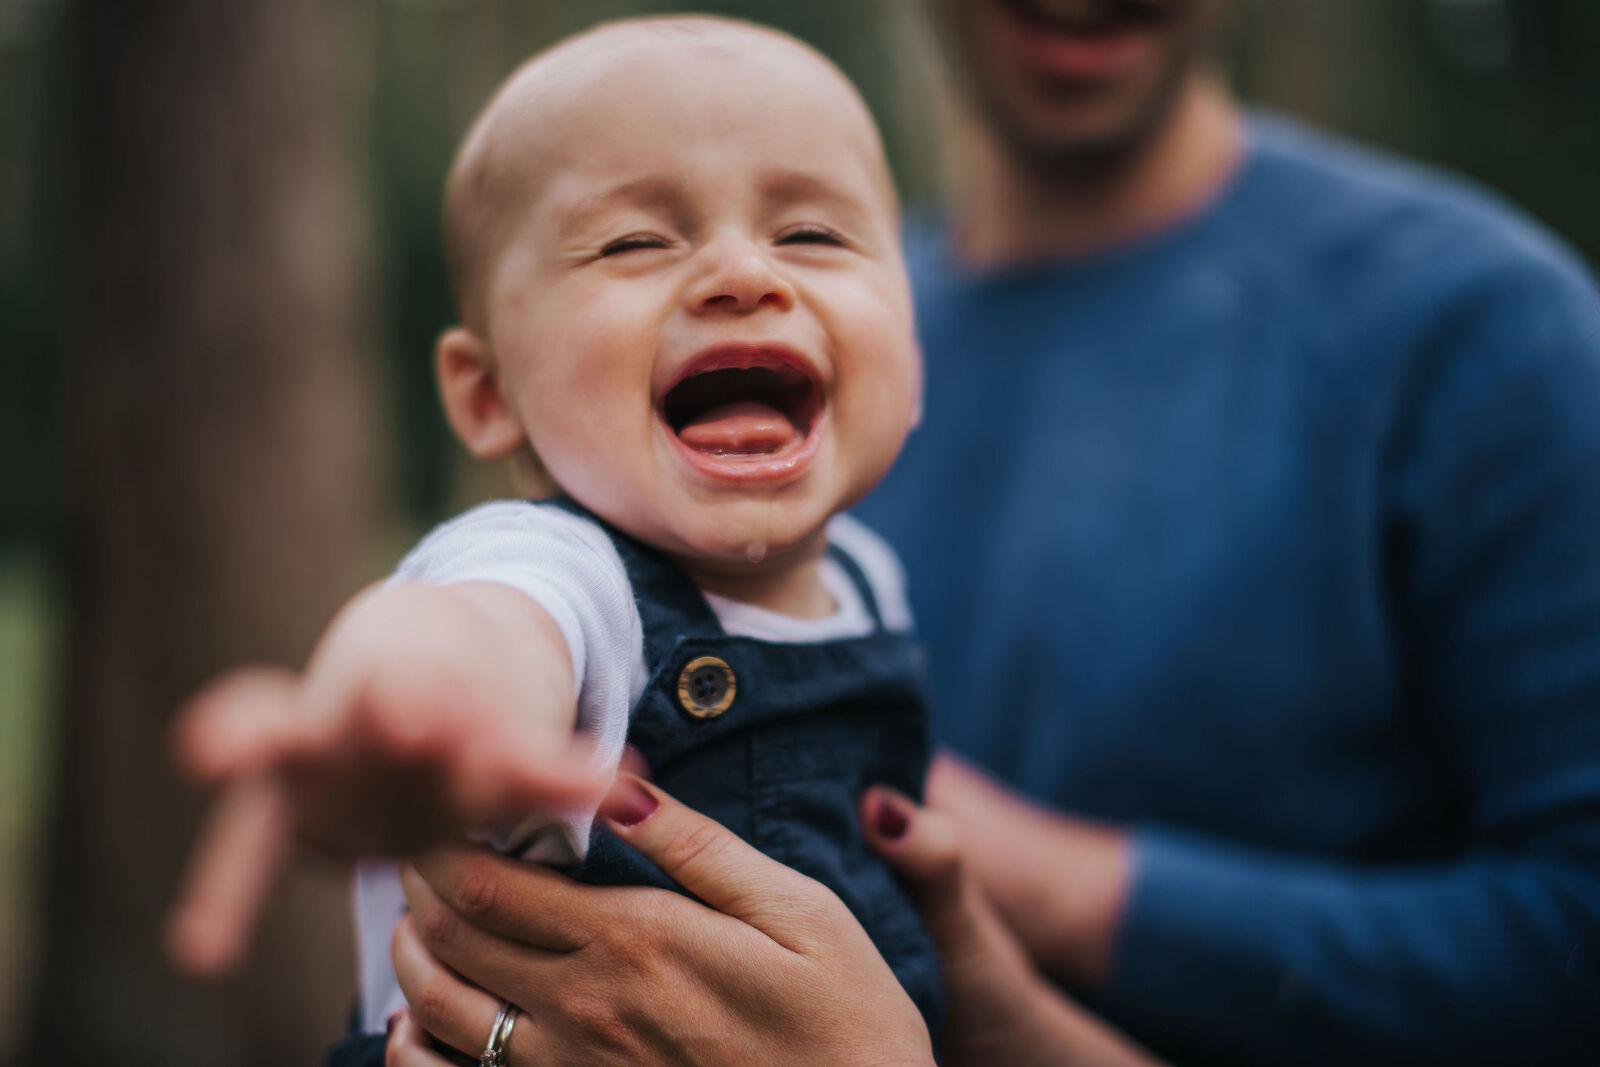 Happy teething baby photo